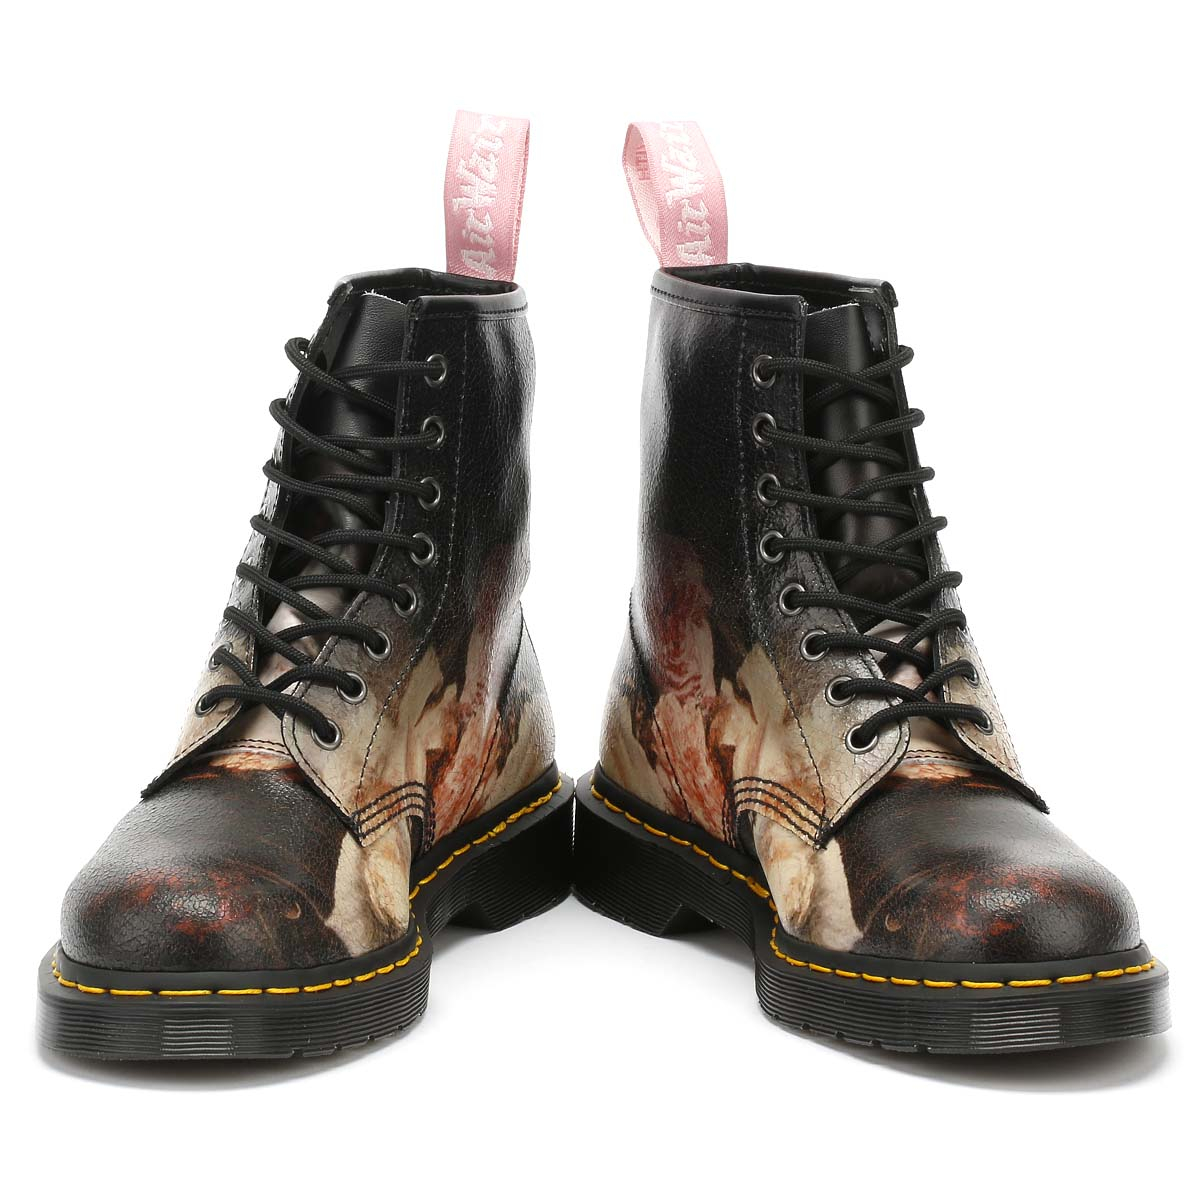 Dr. Martens Unisex Boots New Order Black Cristal Suede Power Corruption Shoes